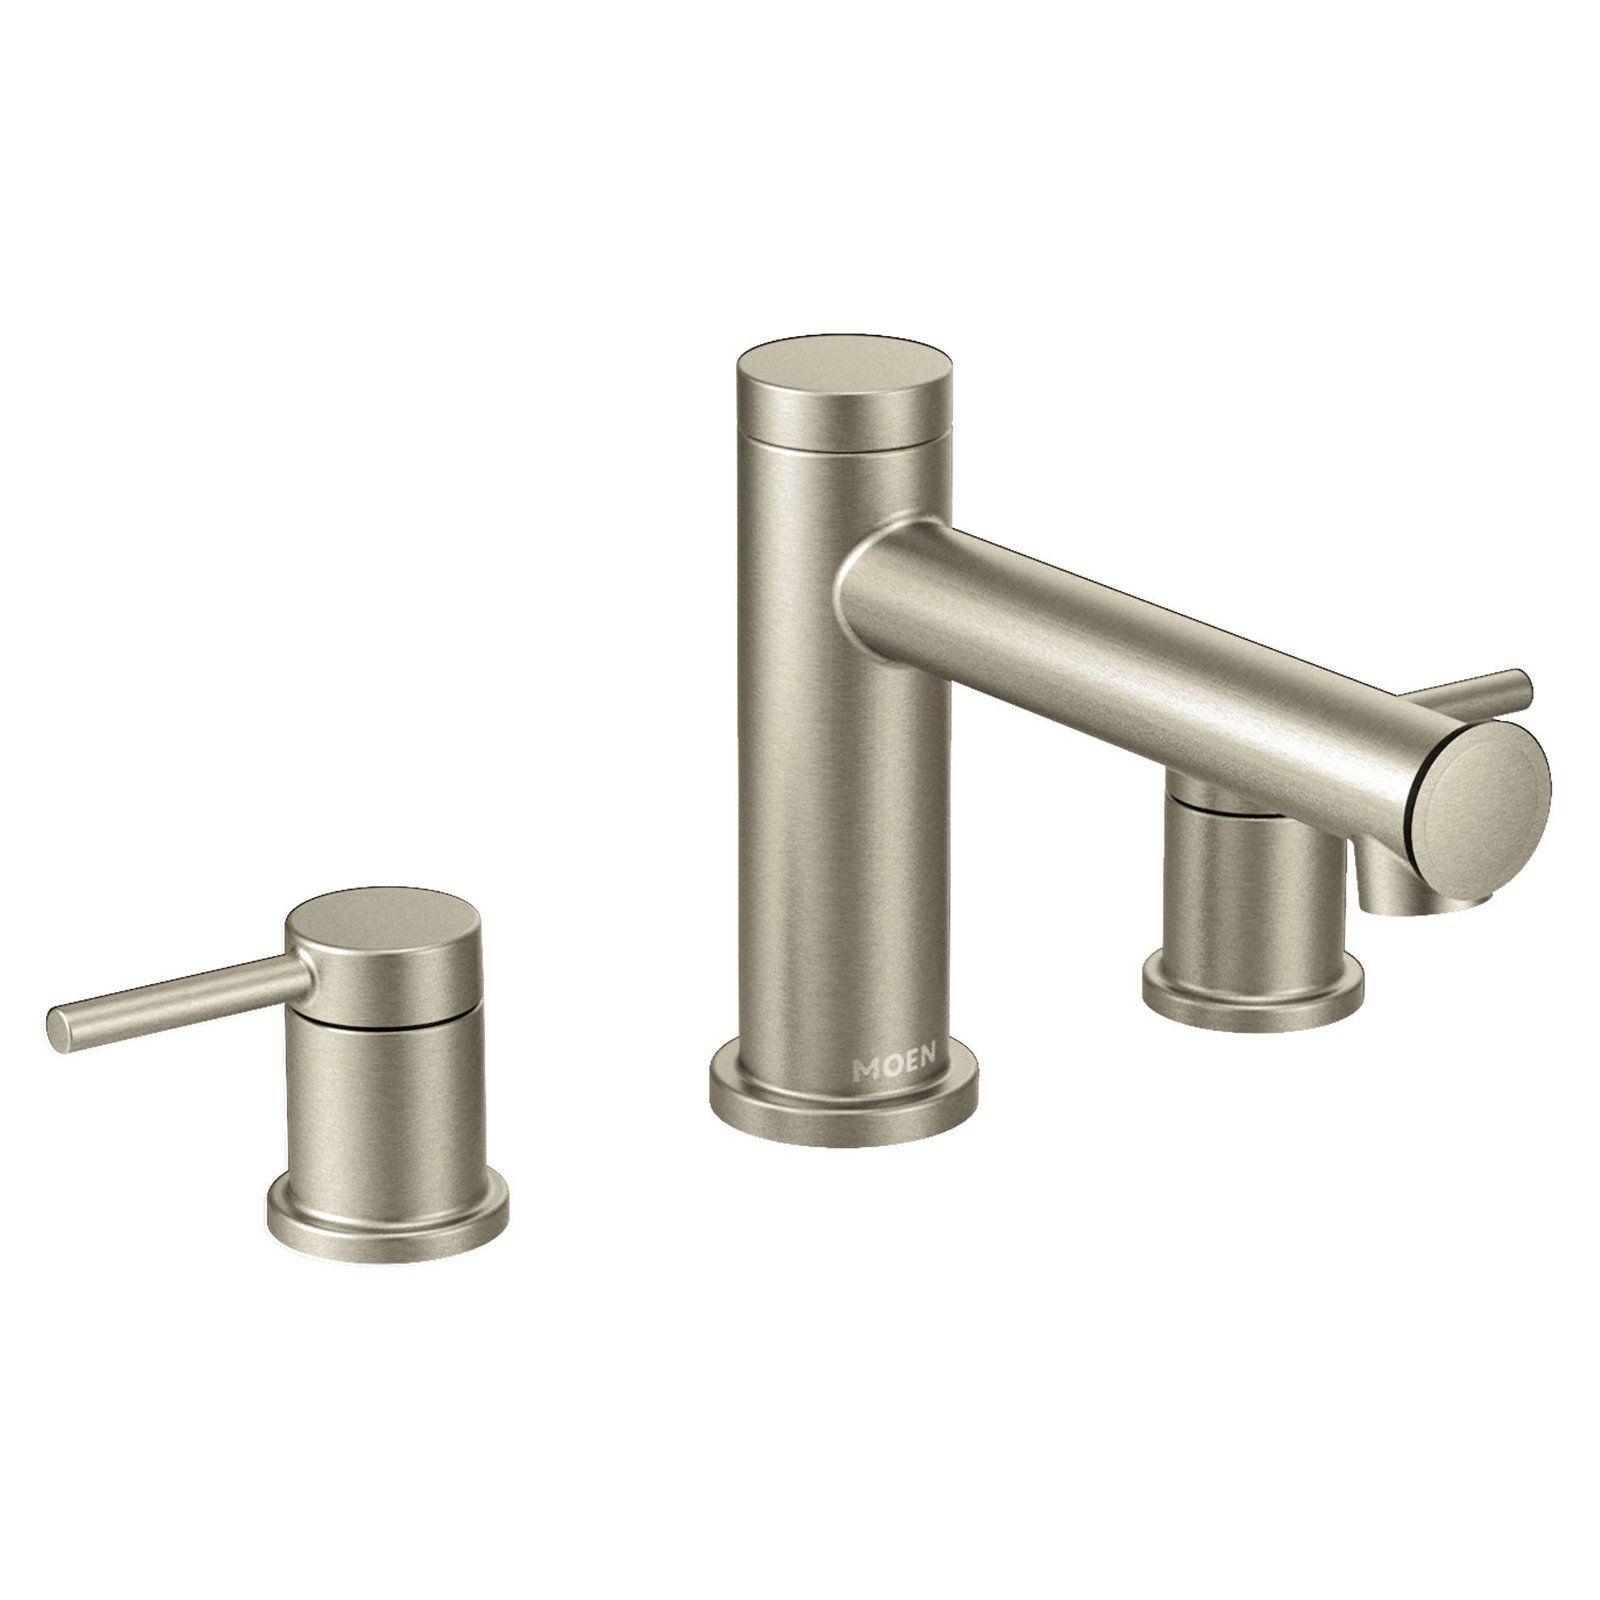 Moen Align Brushed Nickel Two Handle Non Diverter Roman Tub Faucet Roman Tub Faucets Tub Faucet Roman Tub